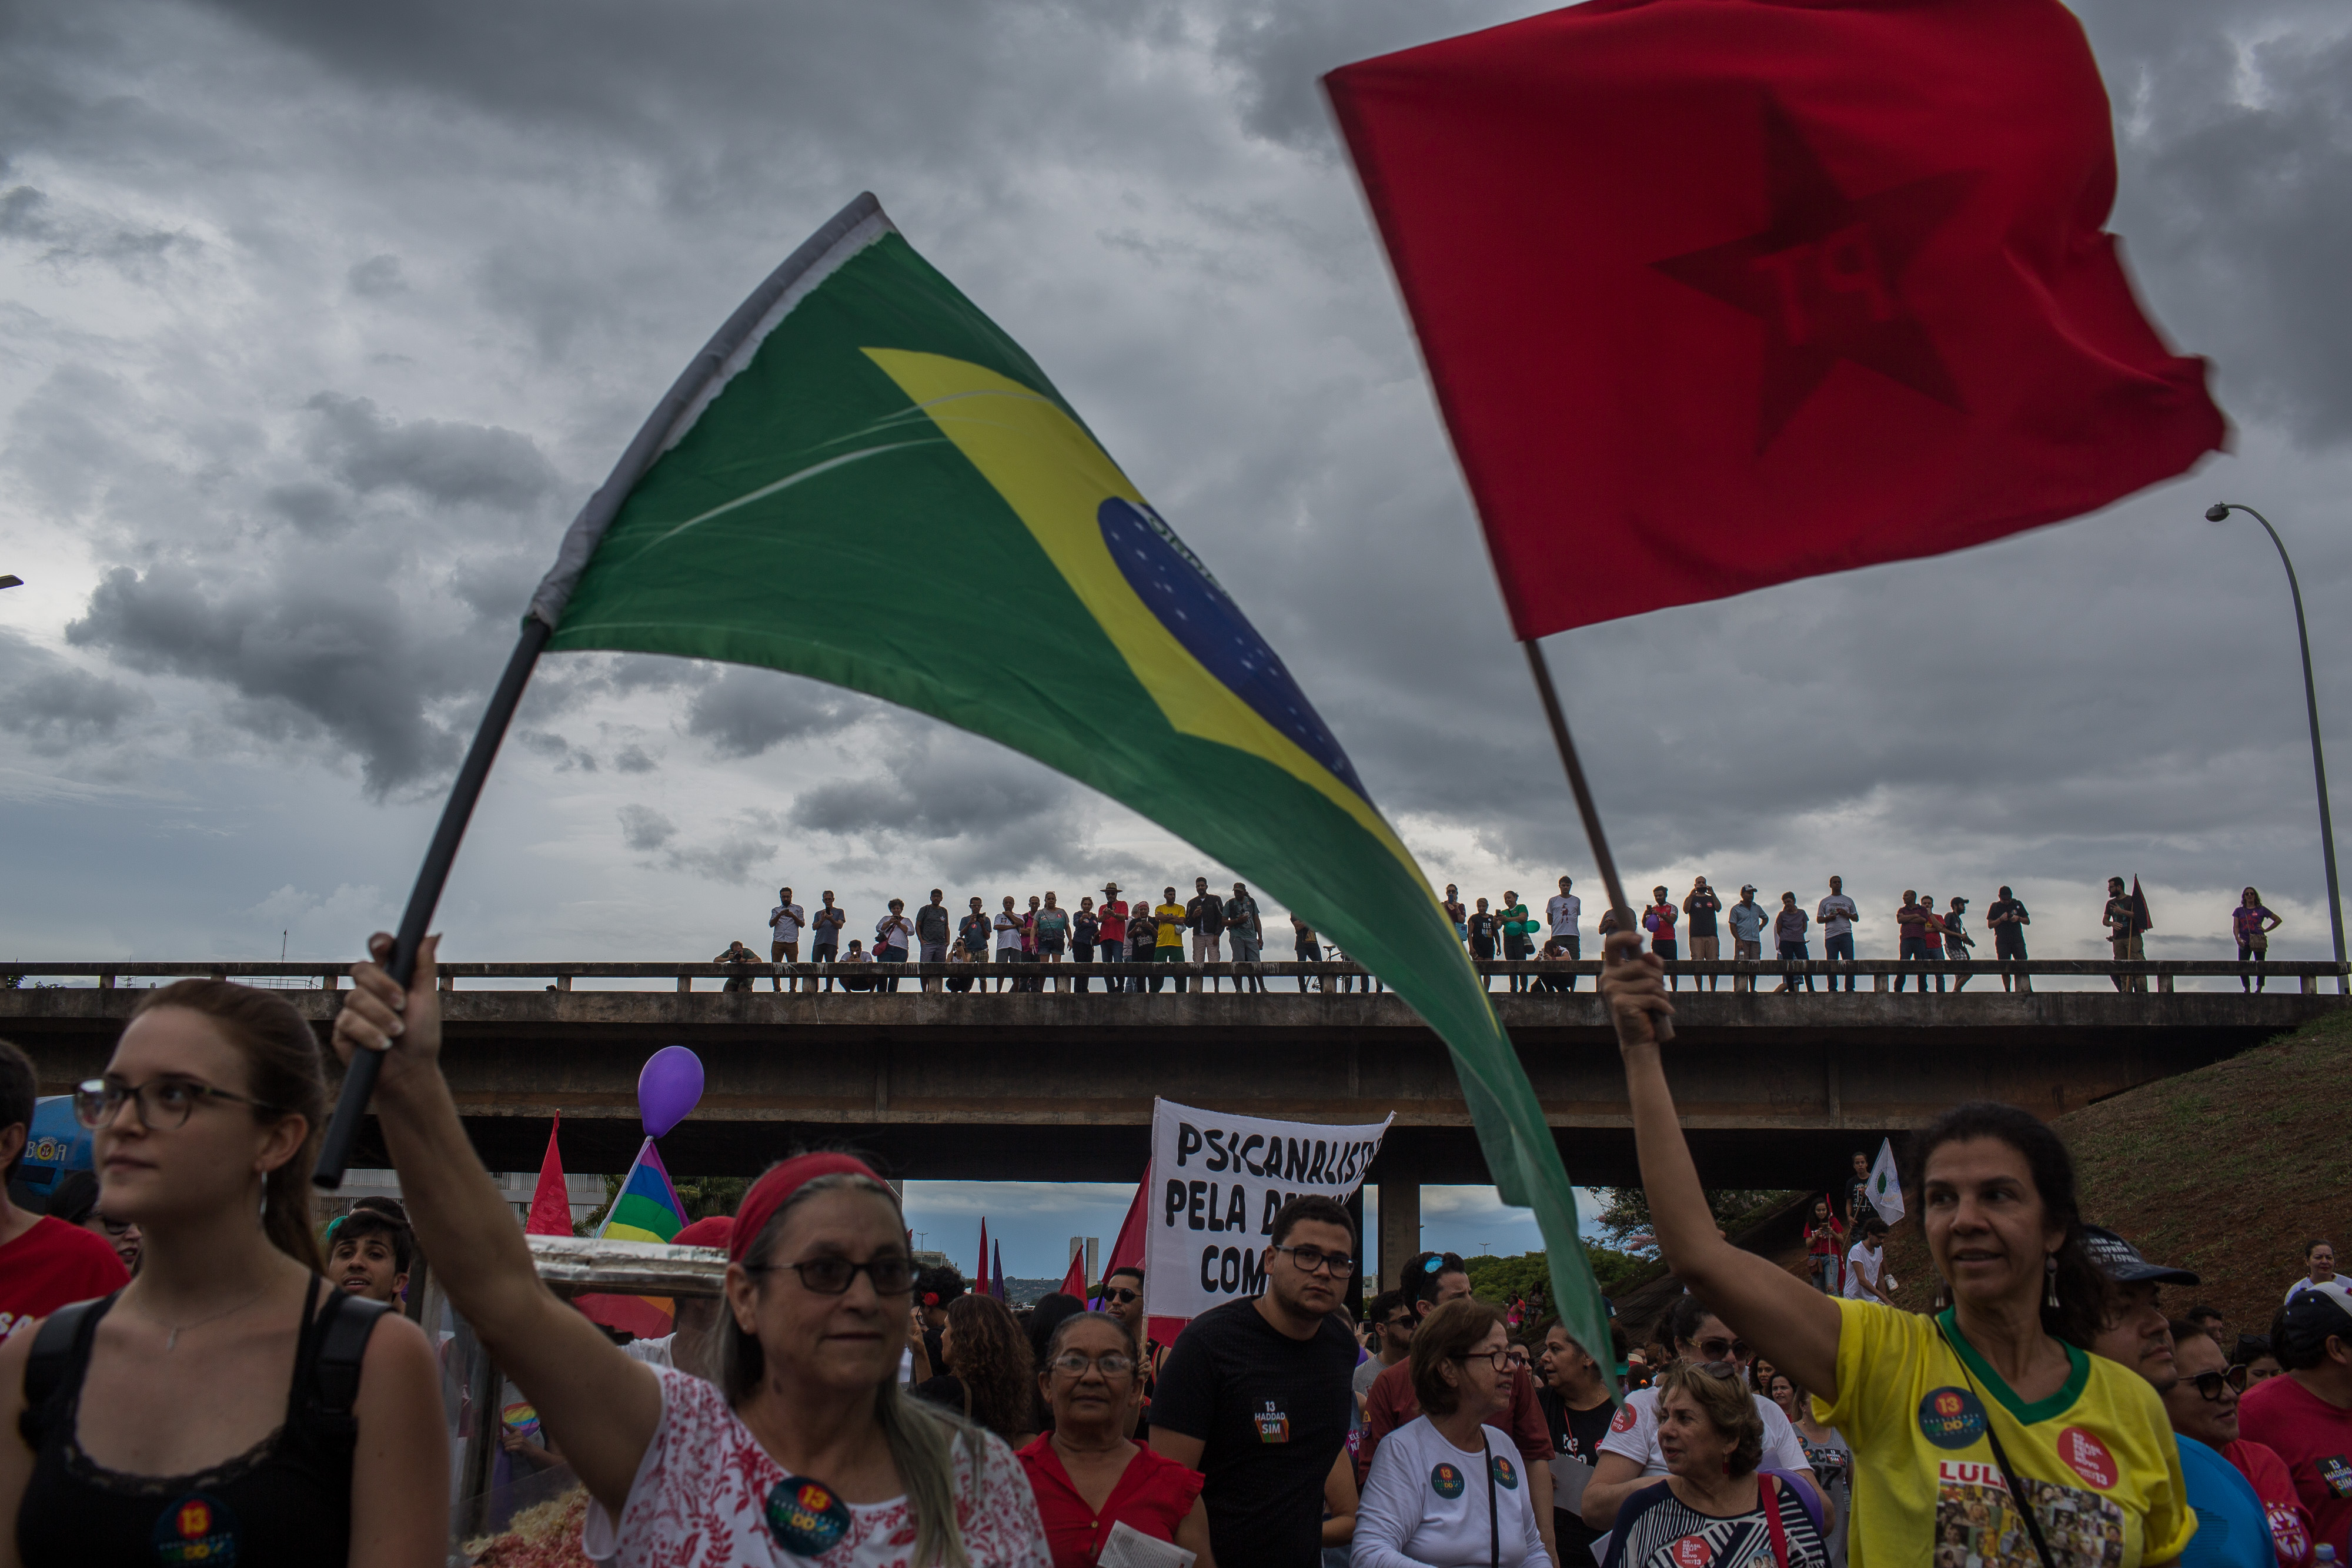 Protestors Rally Across Brazil Against Presidential Candidate Jair Bolsonaro